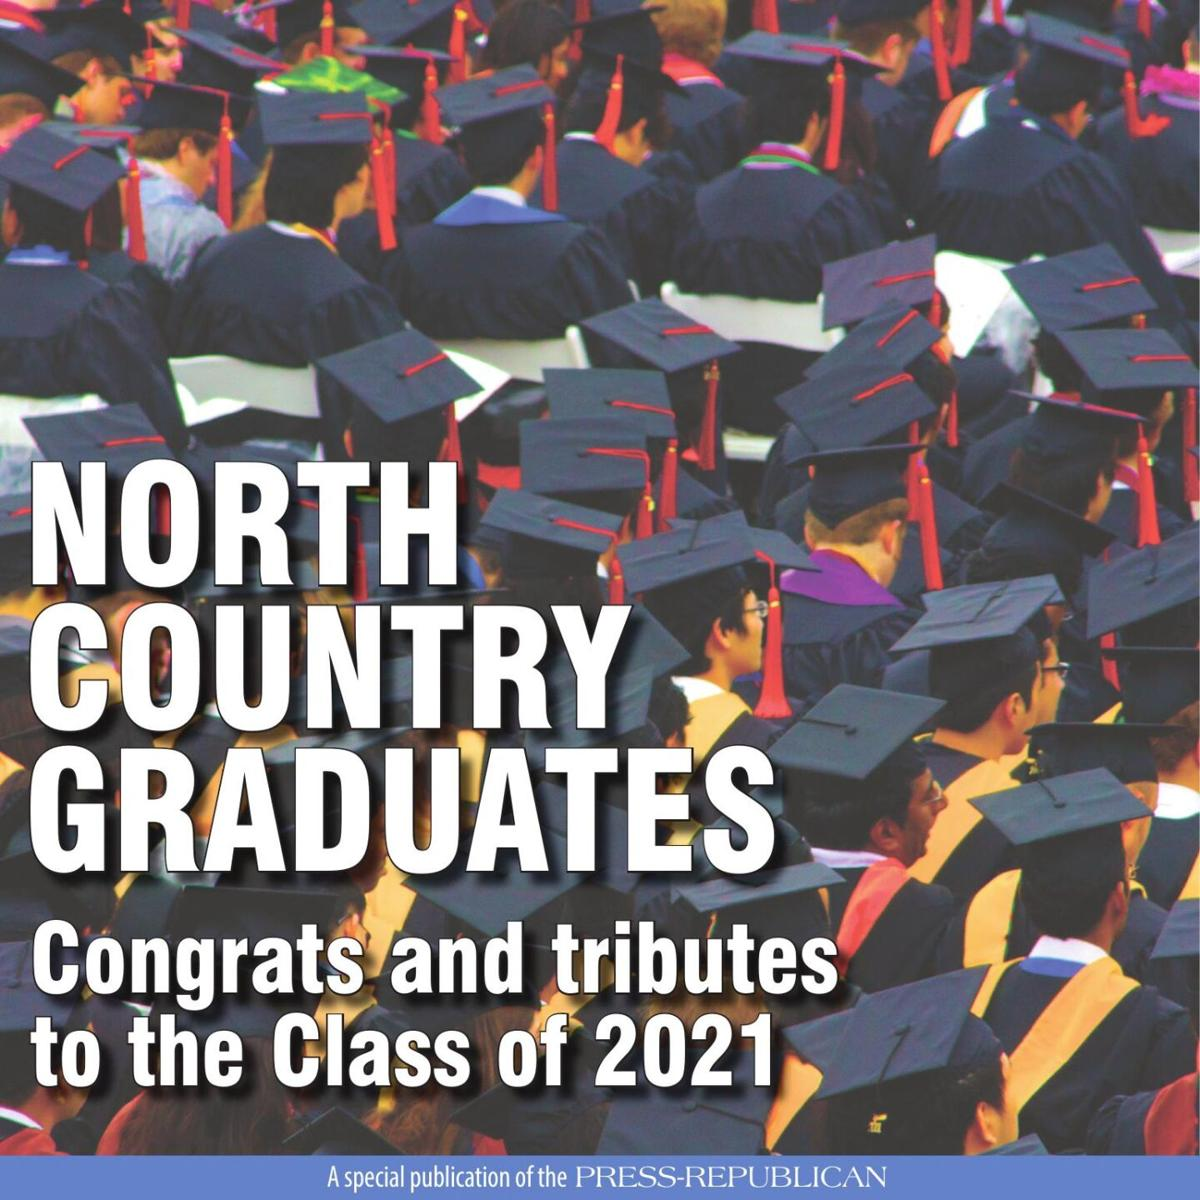 North Country Graduates 2021